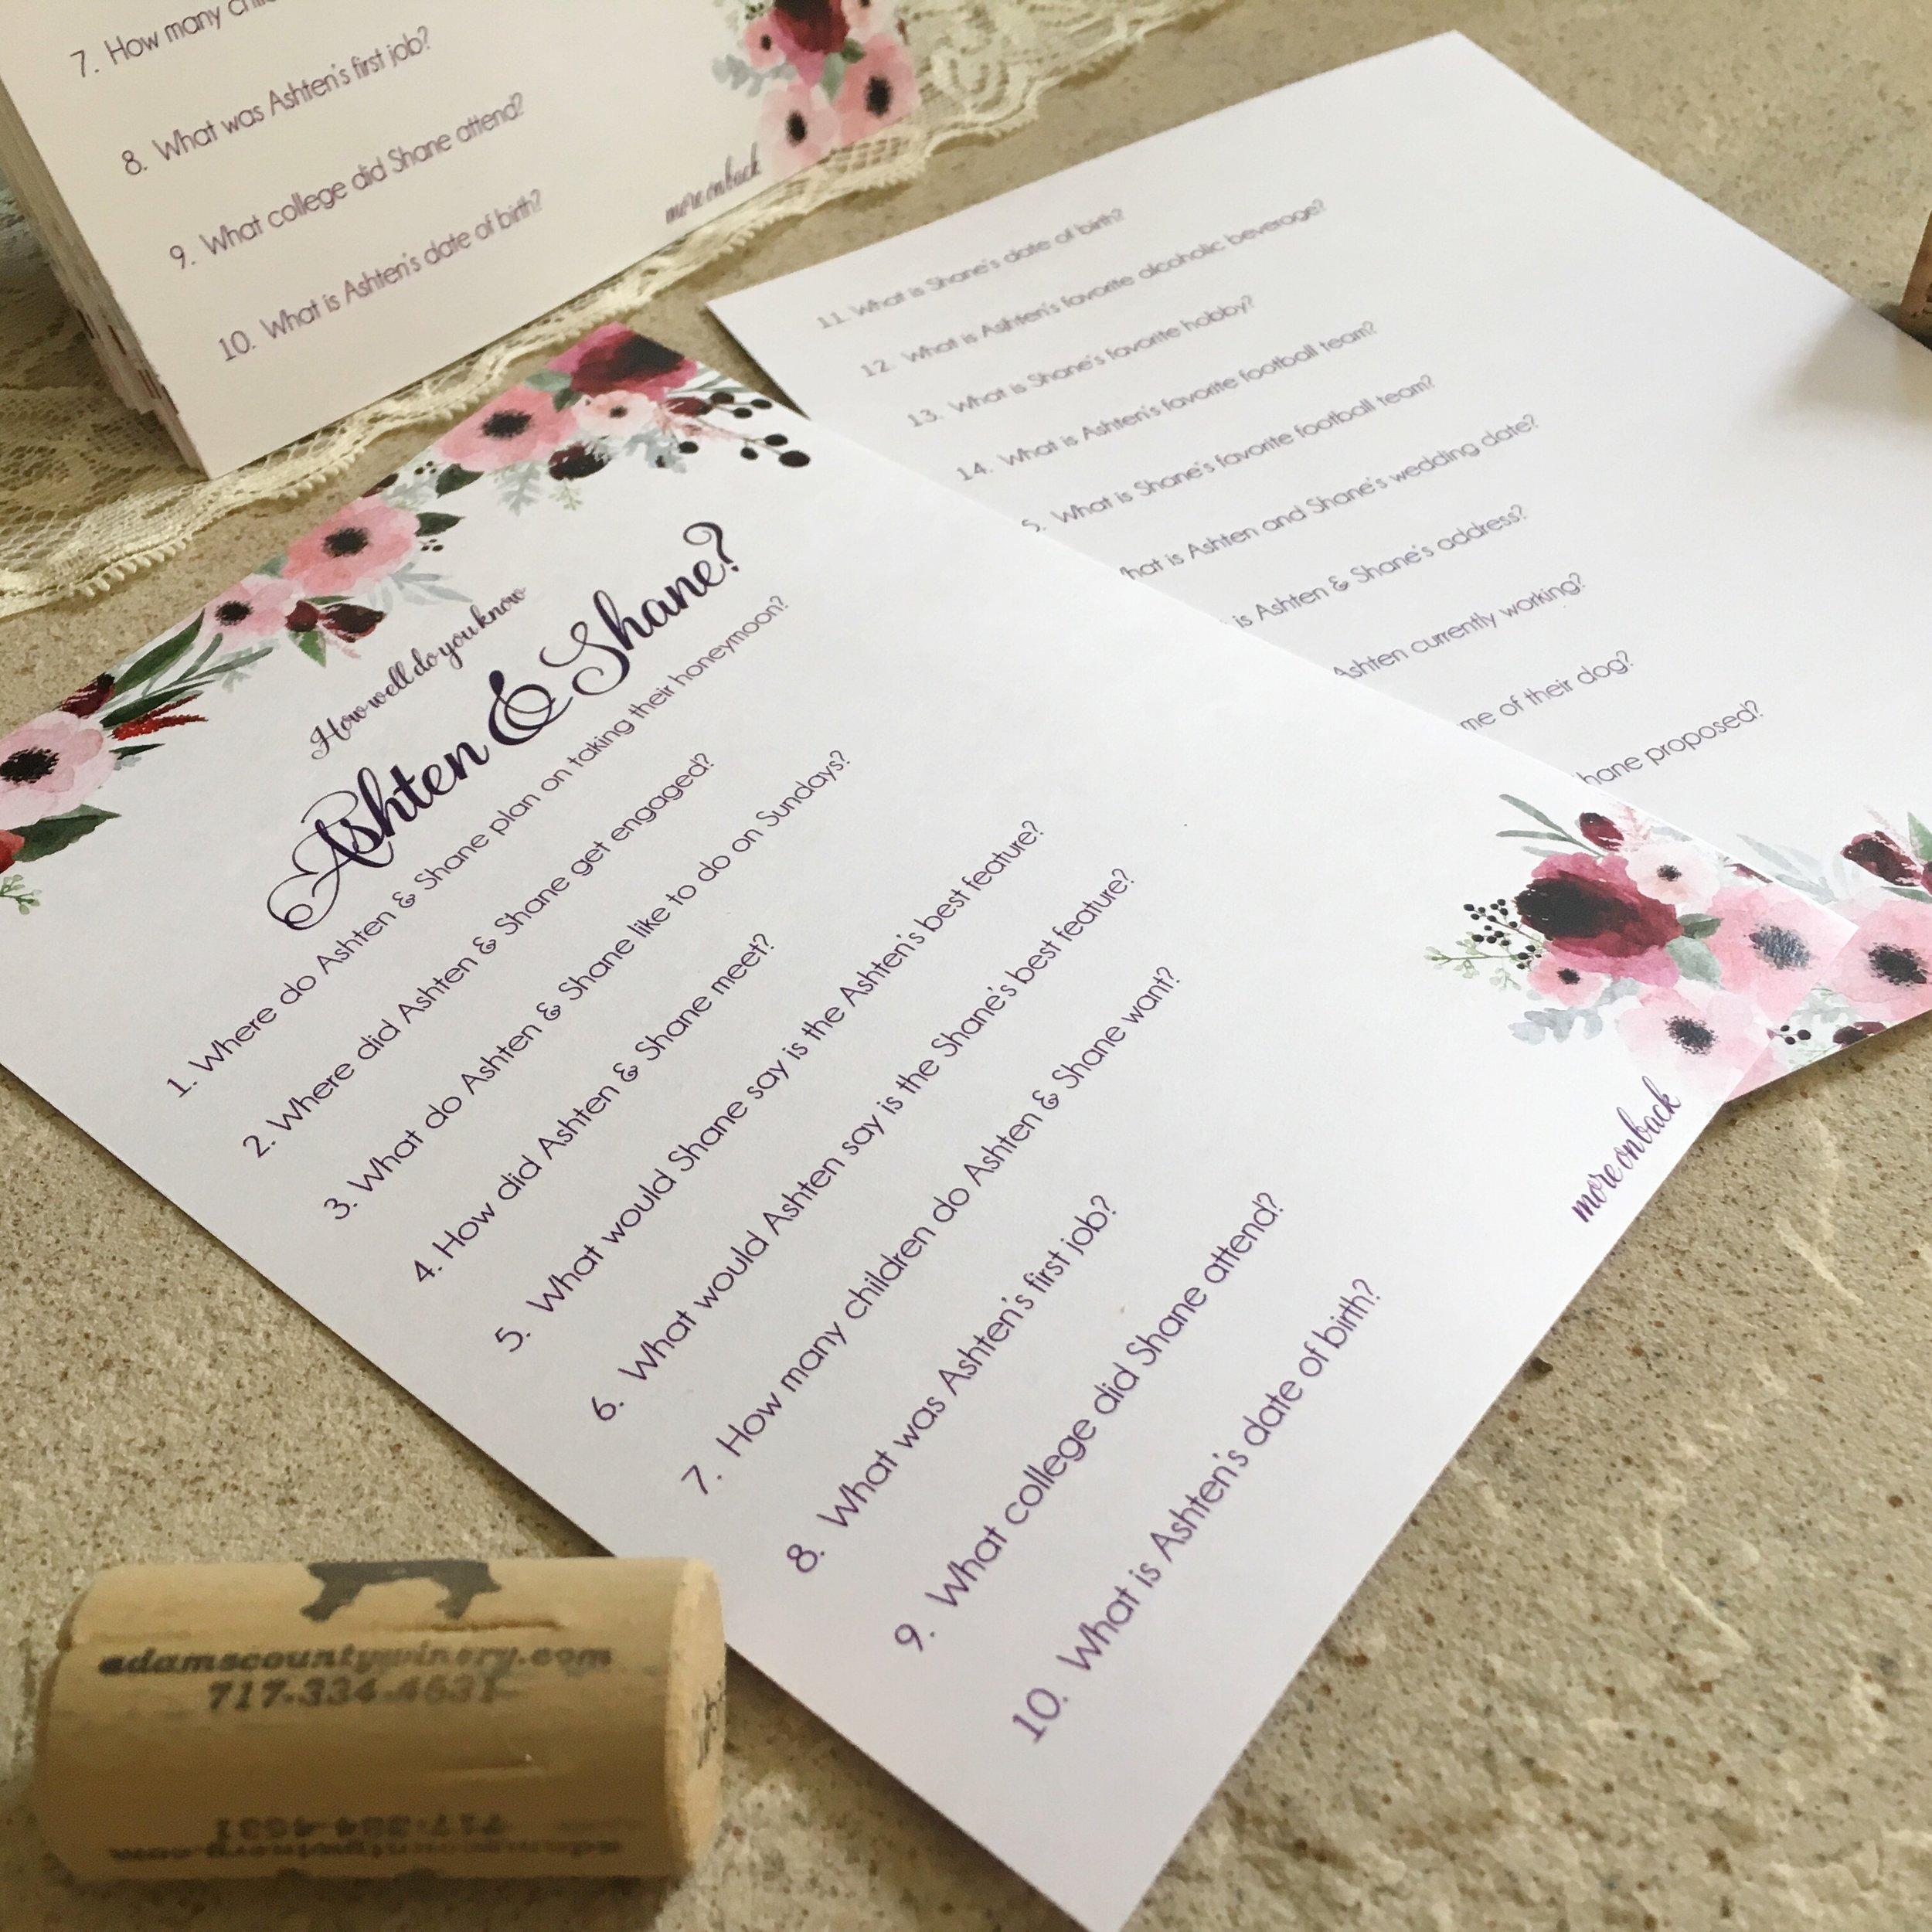 Central PA, York PA, JesSmith Designs, custom, wedding, invitations, bridal, announcements, save the date, birth, baby, motherhood, hanover, calligraphy, handlettering-06-06 13.39.43.jpg